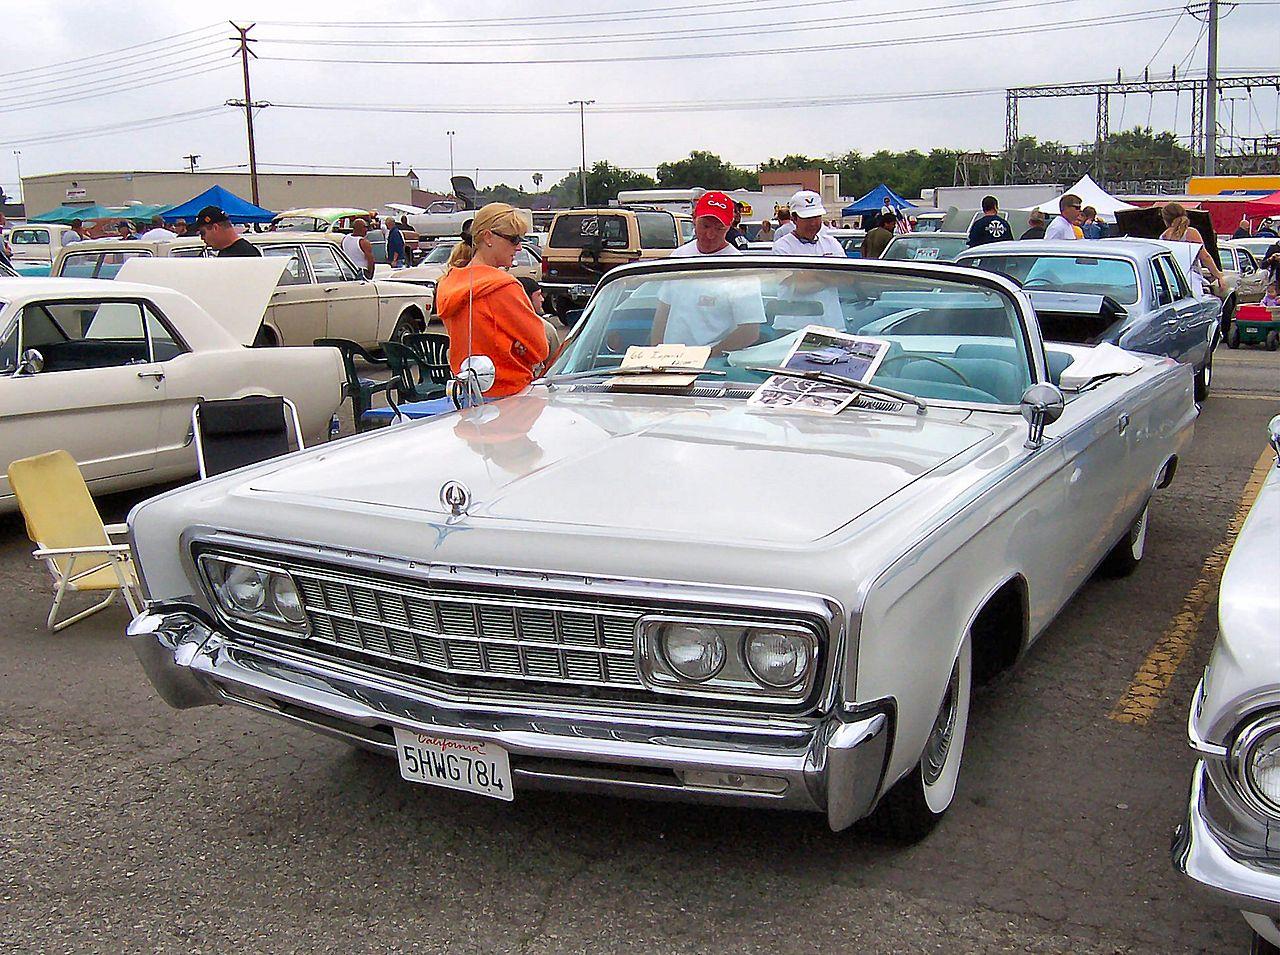 1966 Chrysler Imperial Crown convertible – Myn Transport Blog